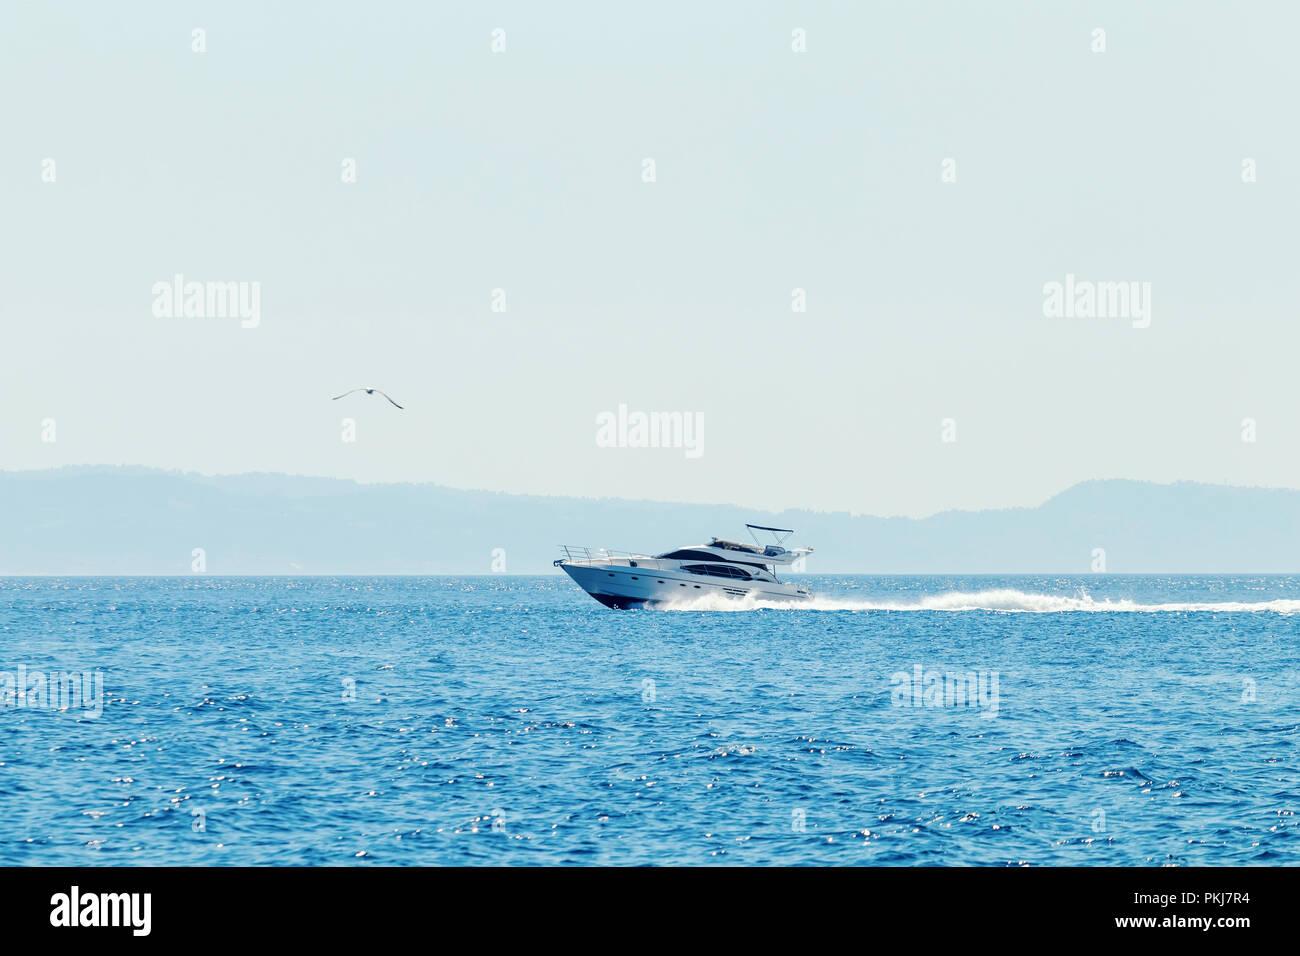 Luxury motor boat cruising in blue sea, Summer vacation - Stock Image